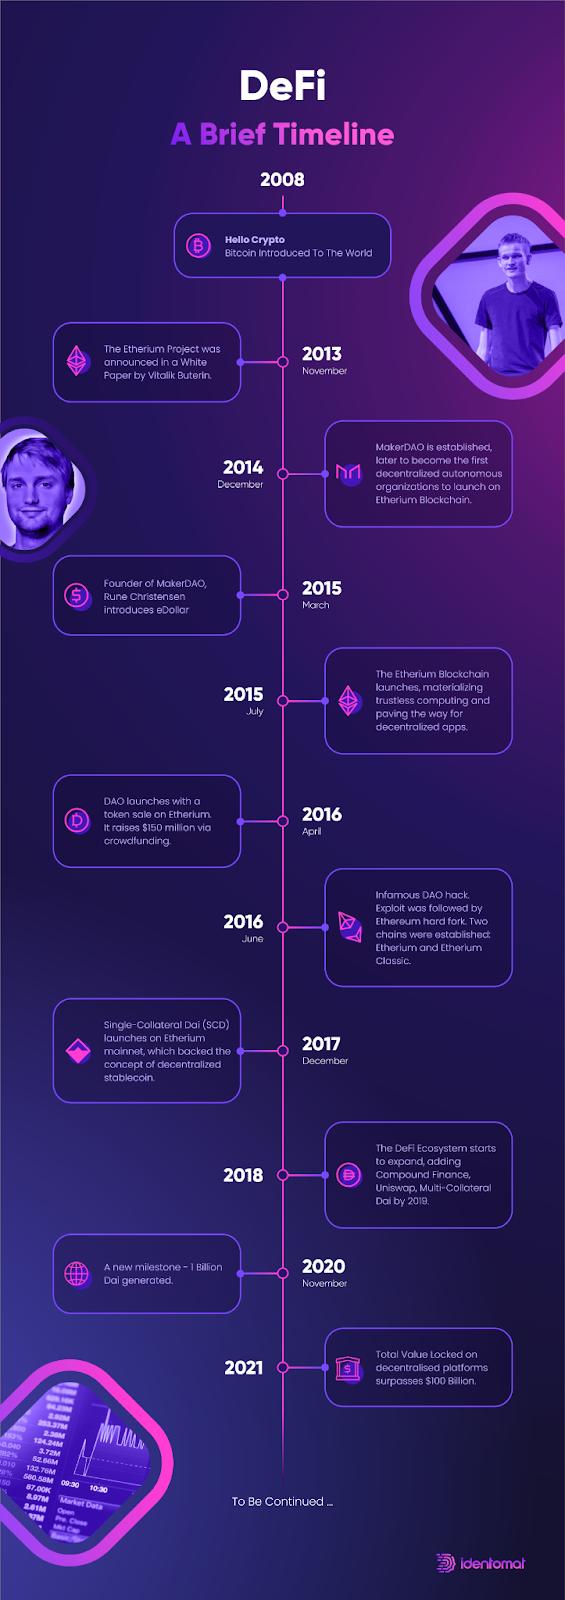 A brief timeline of DeFi ecosystem